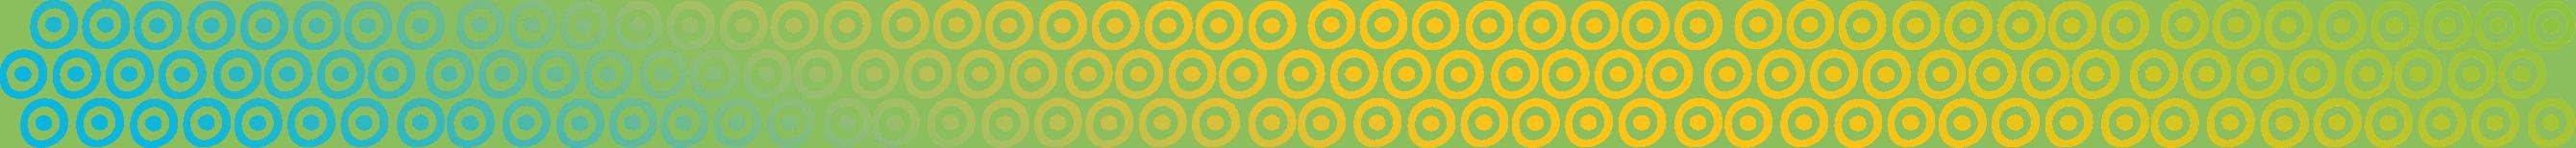 Africa-pattern-4